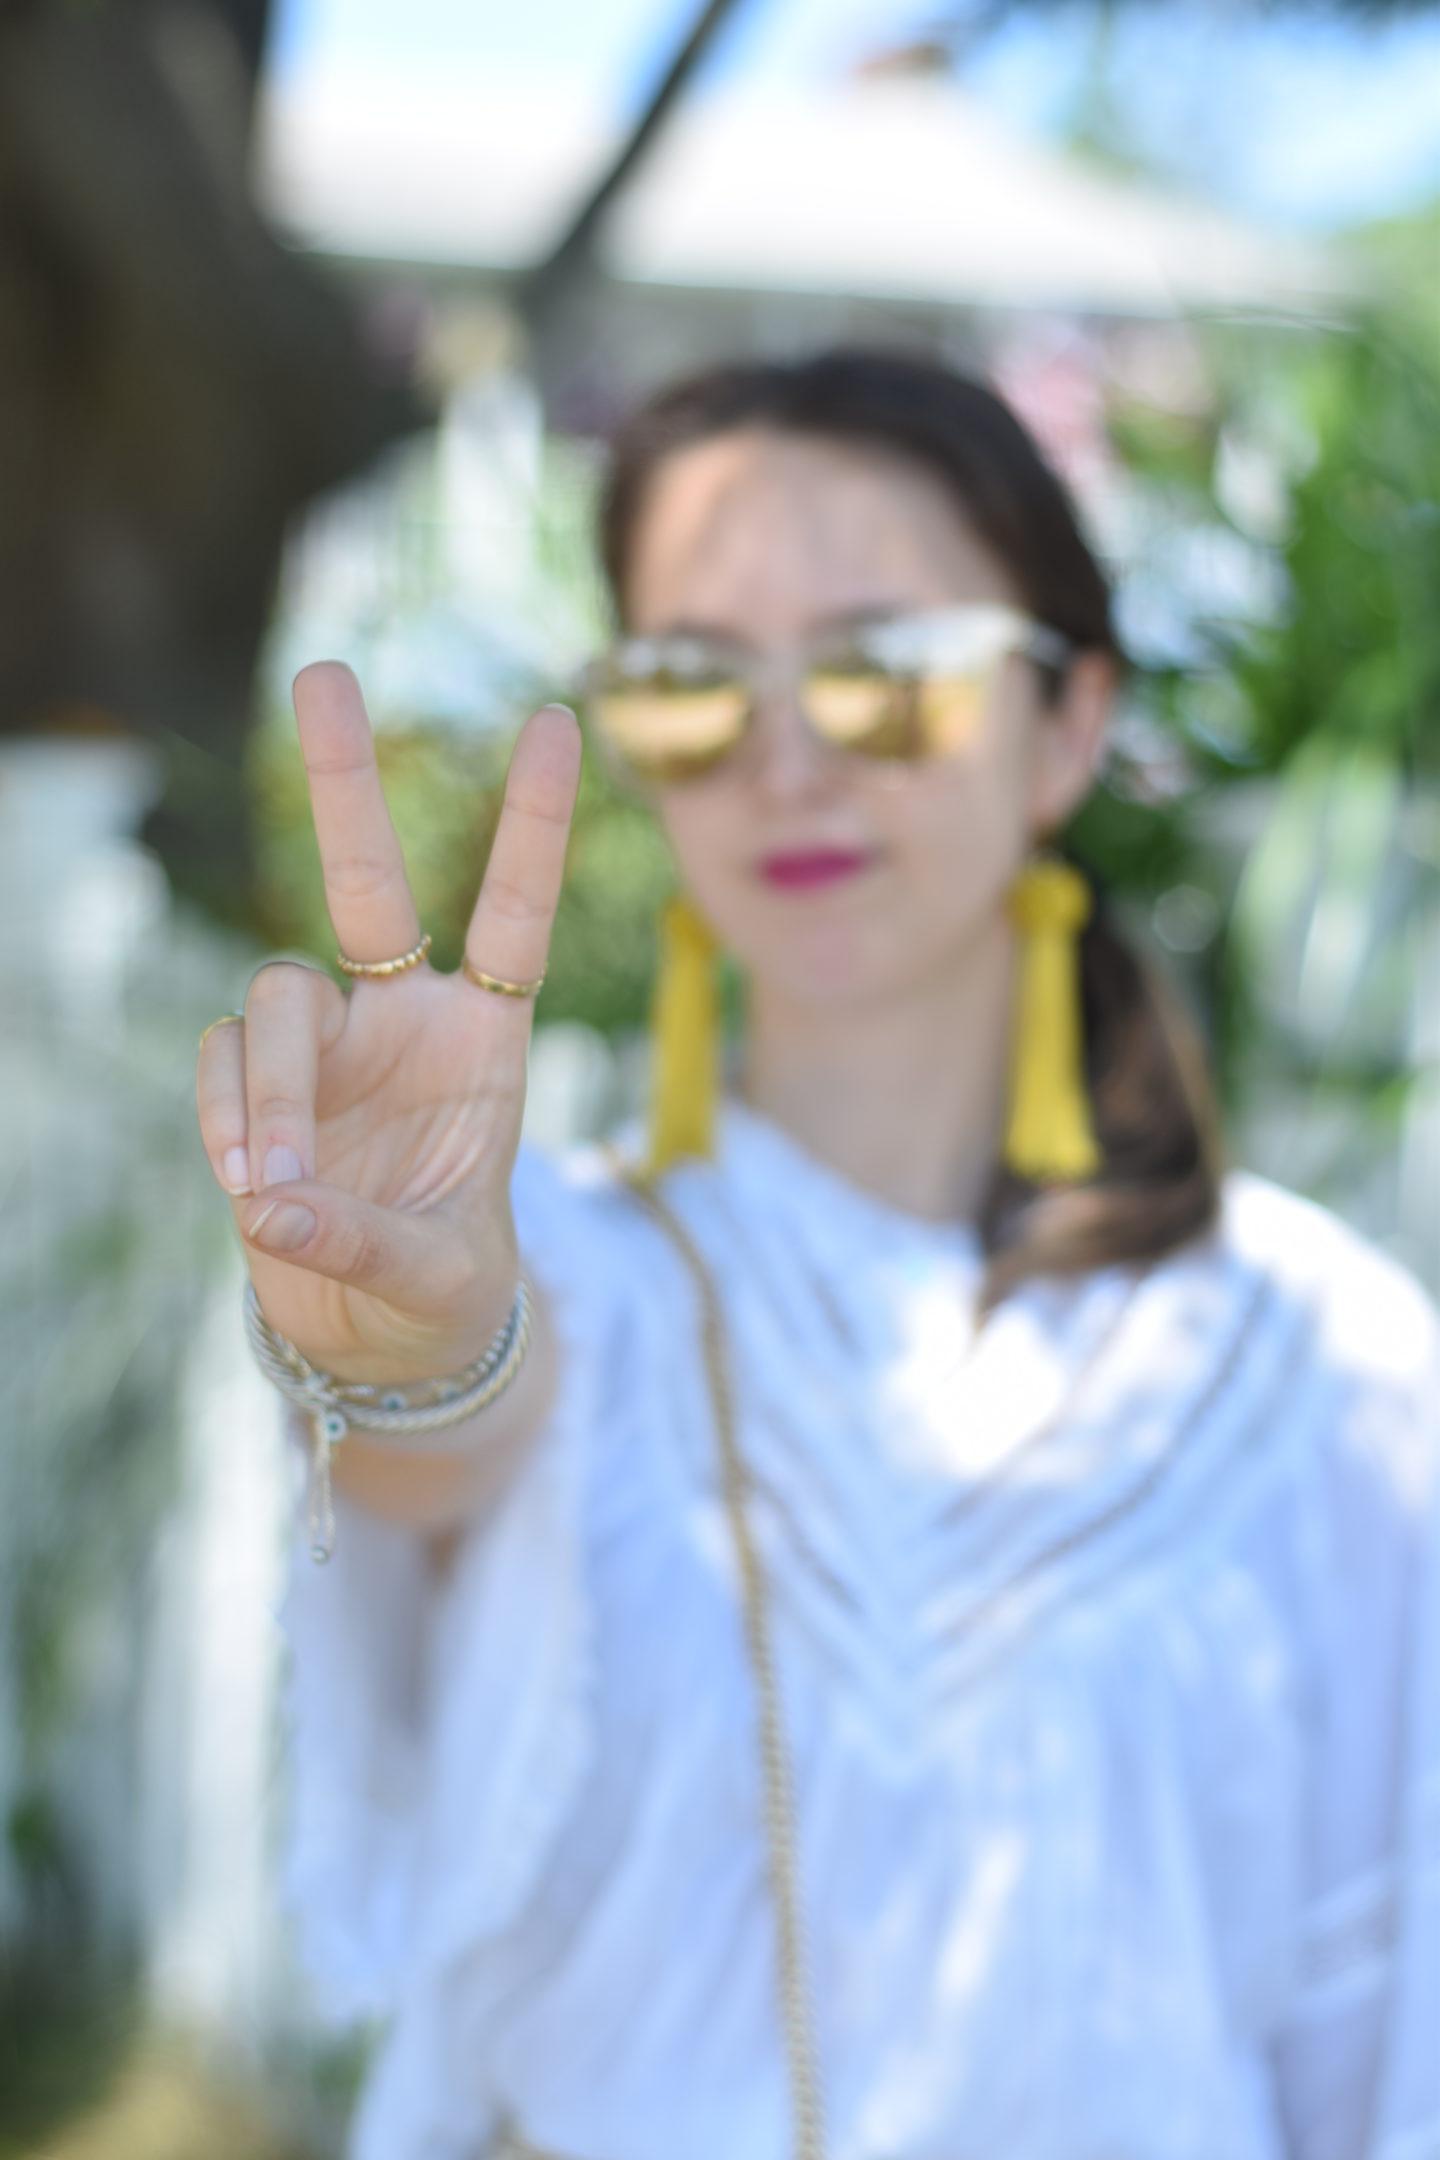 peace-headshot-summer style-dvf